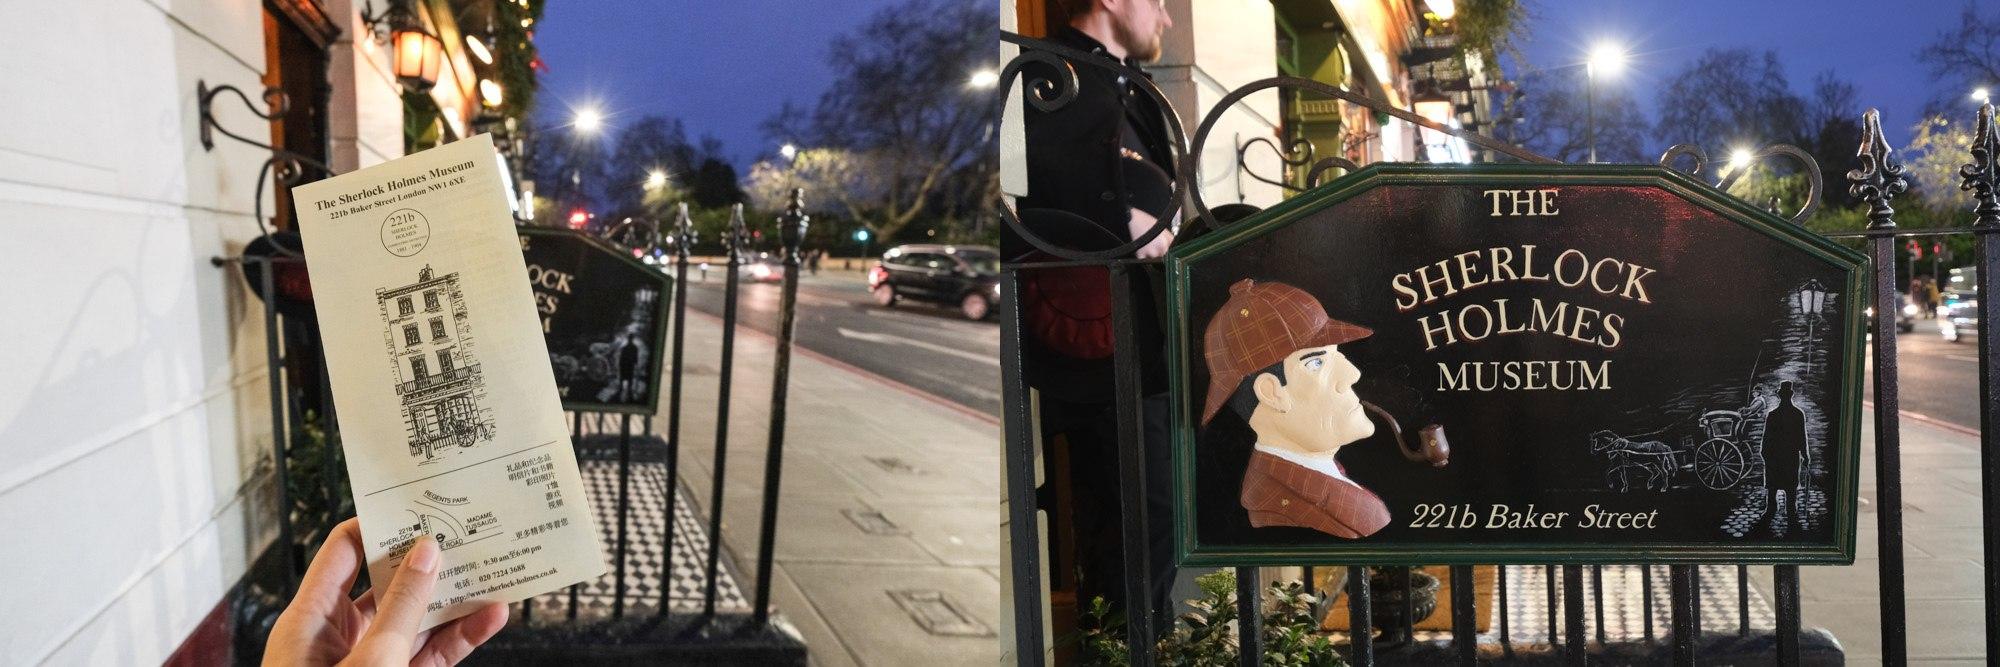 The Sherlock Holmes Museum, 福爾摩斯博物館, 英國倫敦景點, 倫敦貝克街, Baker Street, 福爾摩斯的家, 倫敦福爾摩斯場景